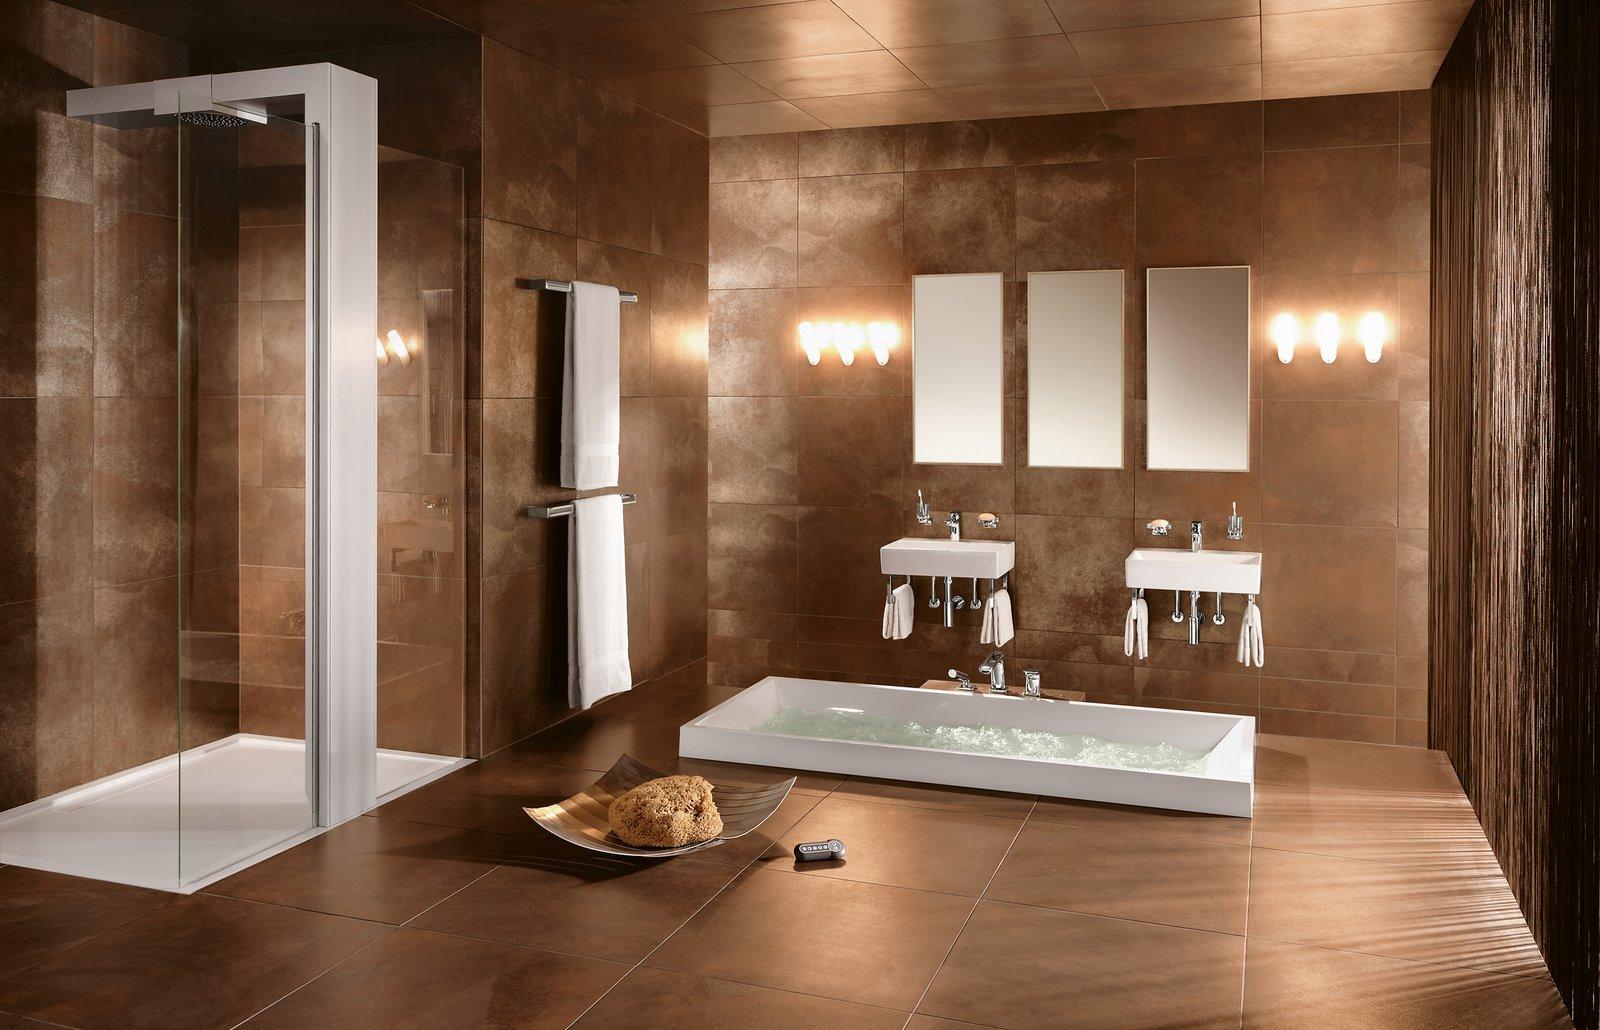 Alles Voor Badkamer : Alles over badkamers complete badkamers